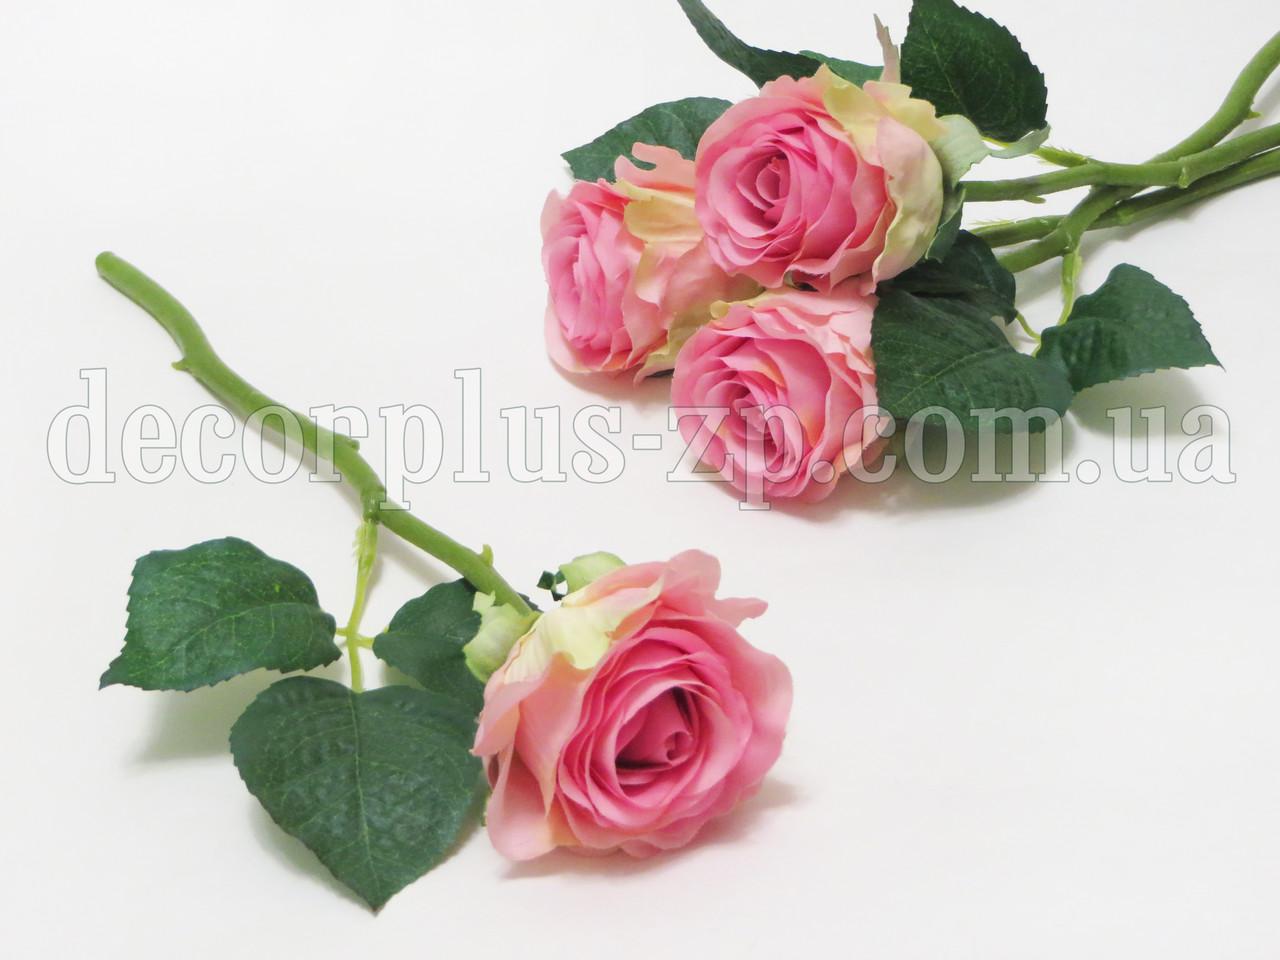 Розочка на стебле, короткая розовая